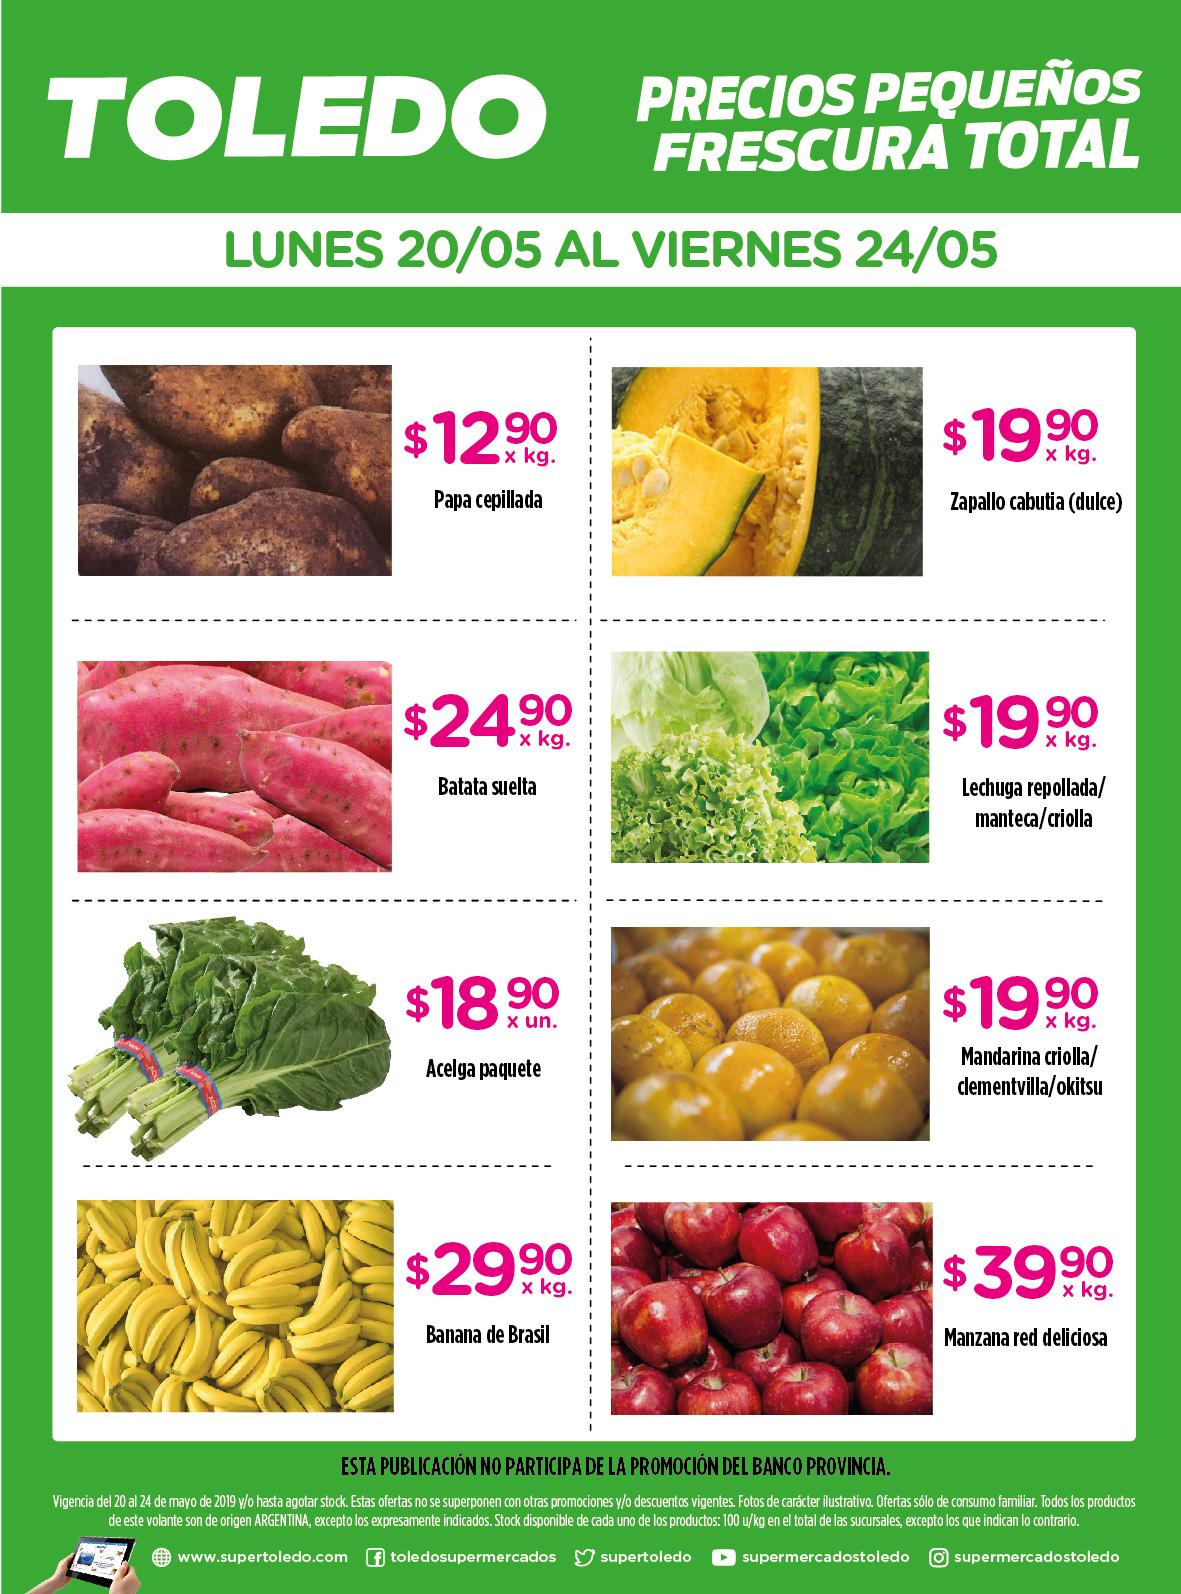 1-20x27-Verduleria_Carniceria-20-AL-24-01